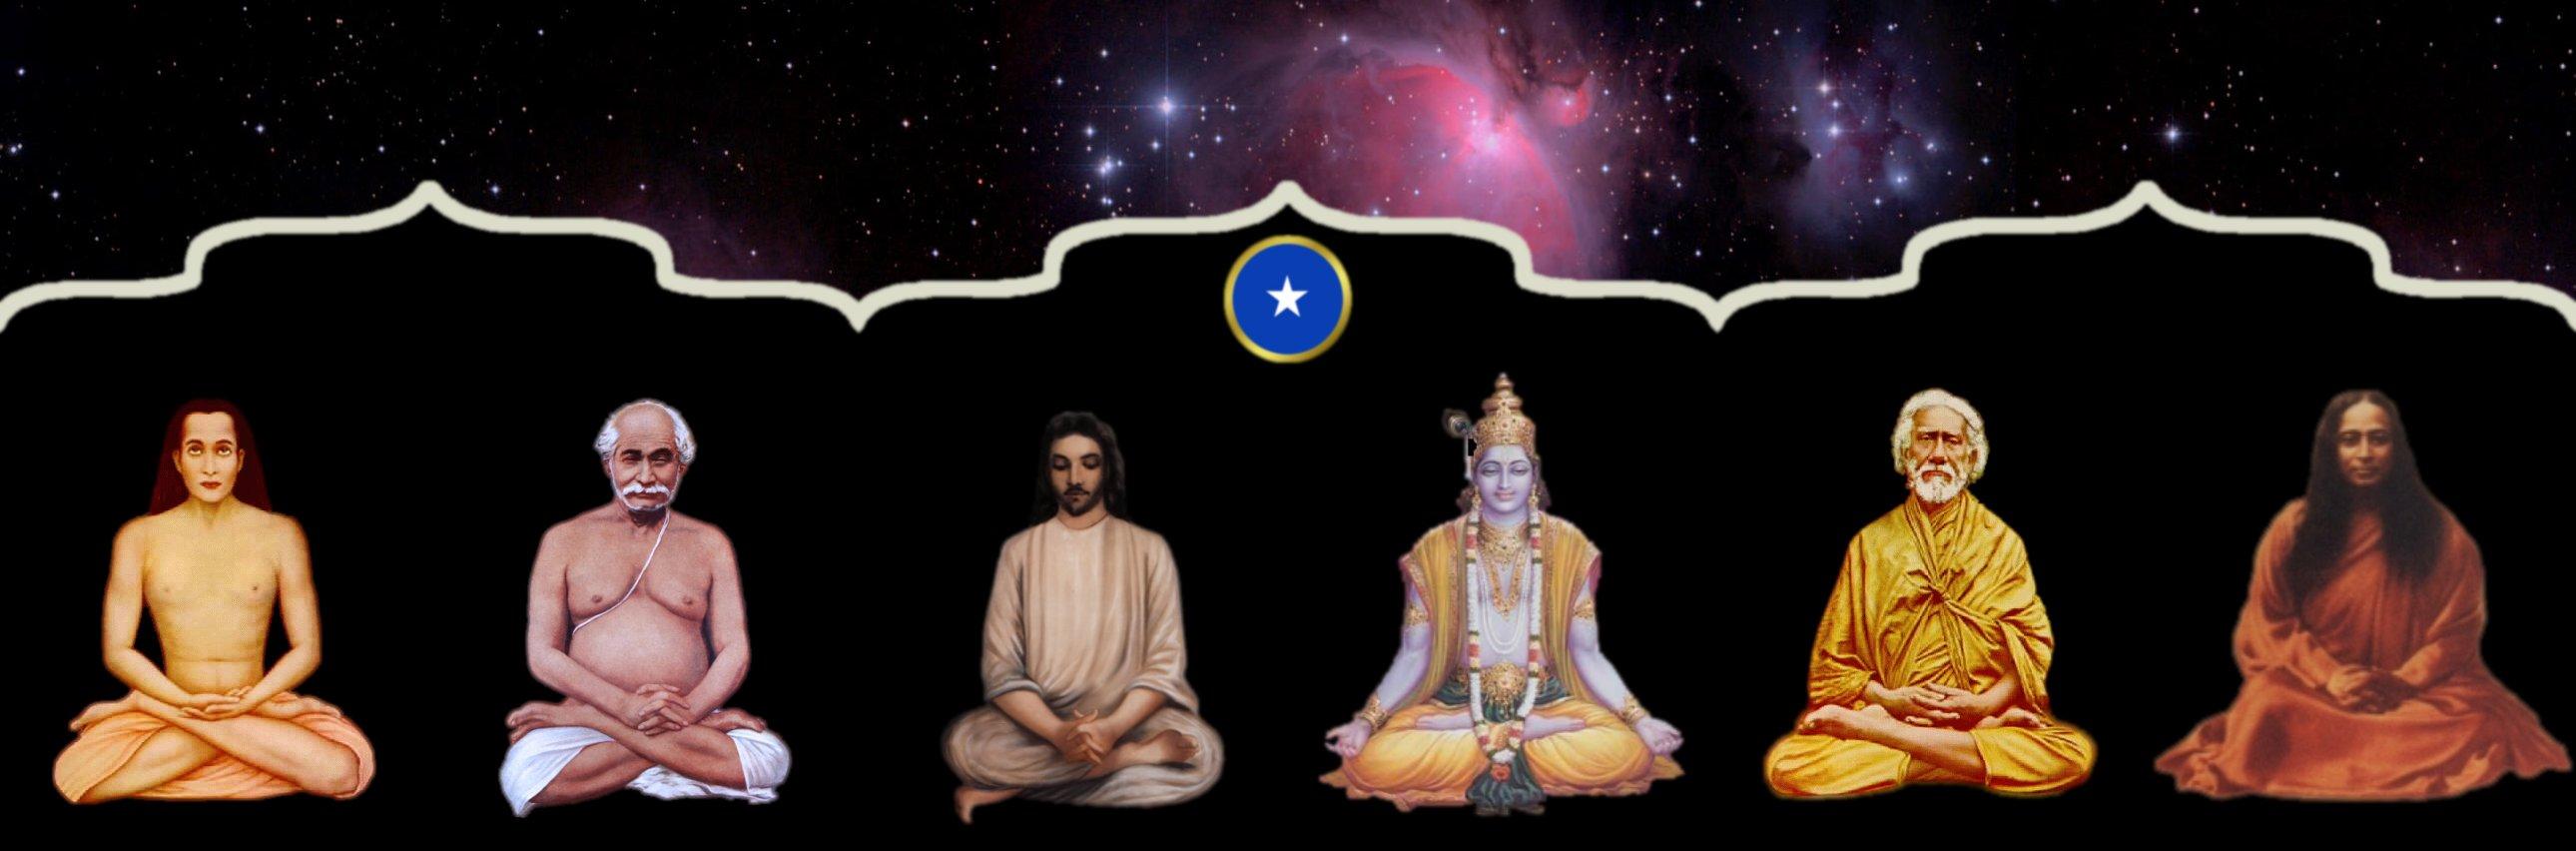 Kriya Yoga Masters Altar By Ashure On Deviantart